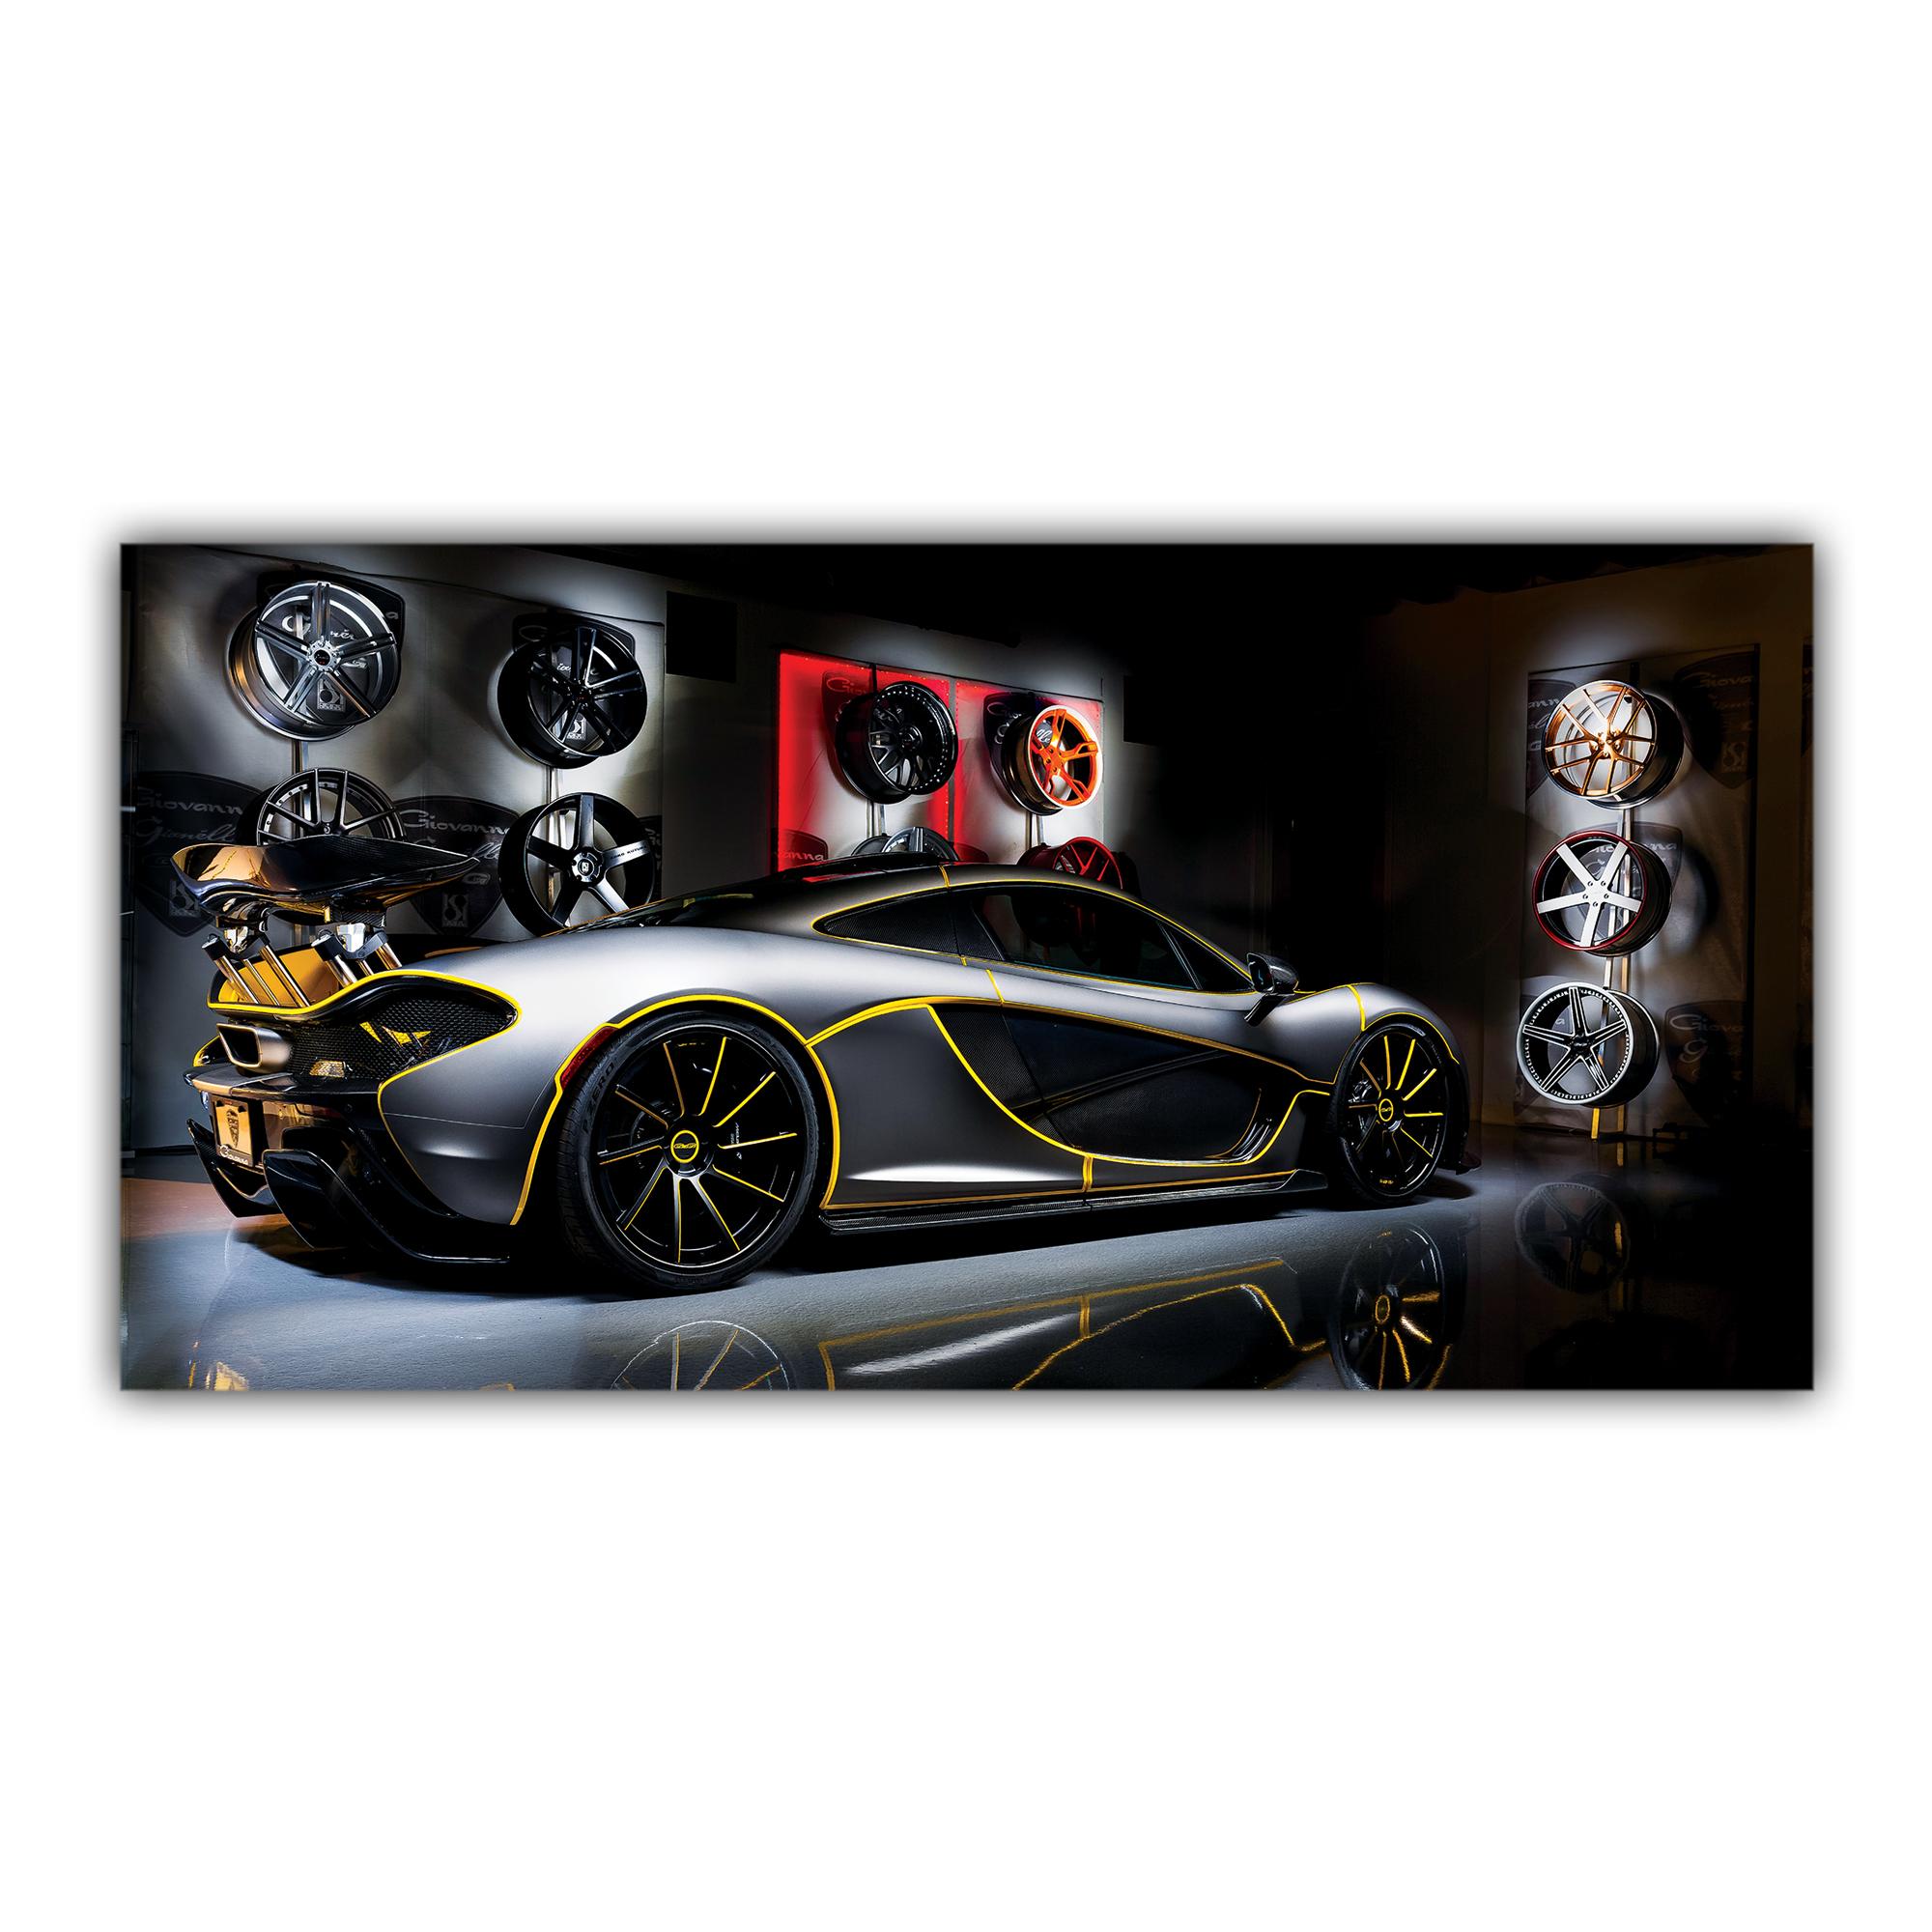 McLaren P1 Hypercar Voiture Sport Jantes